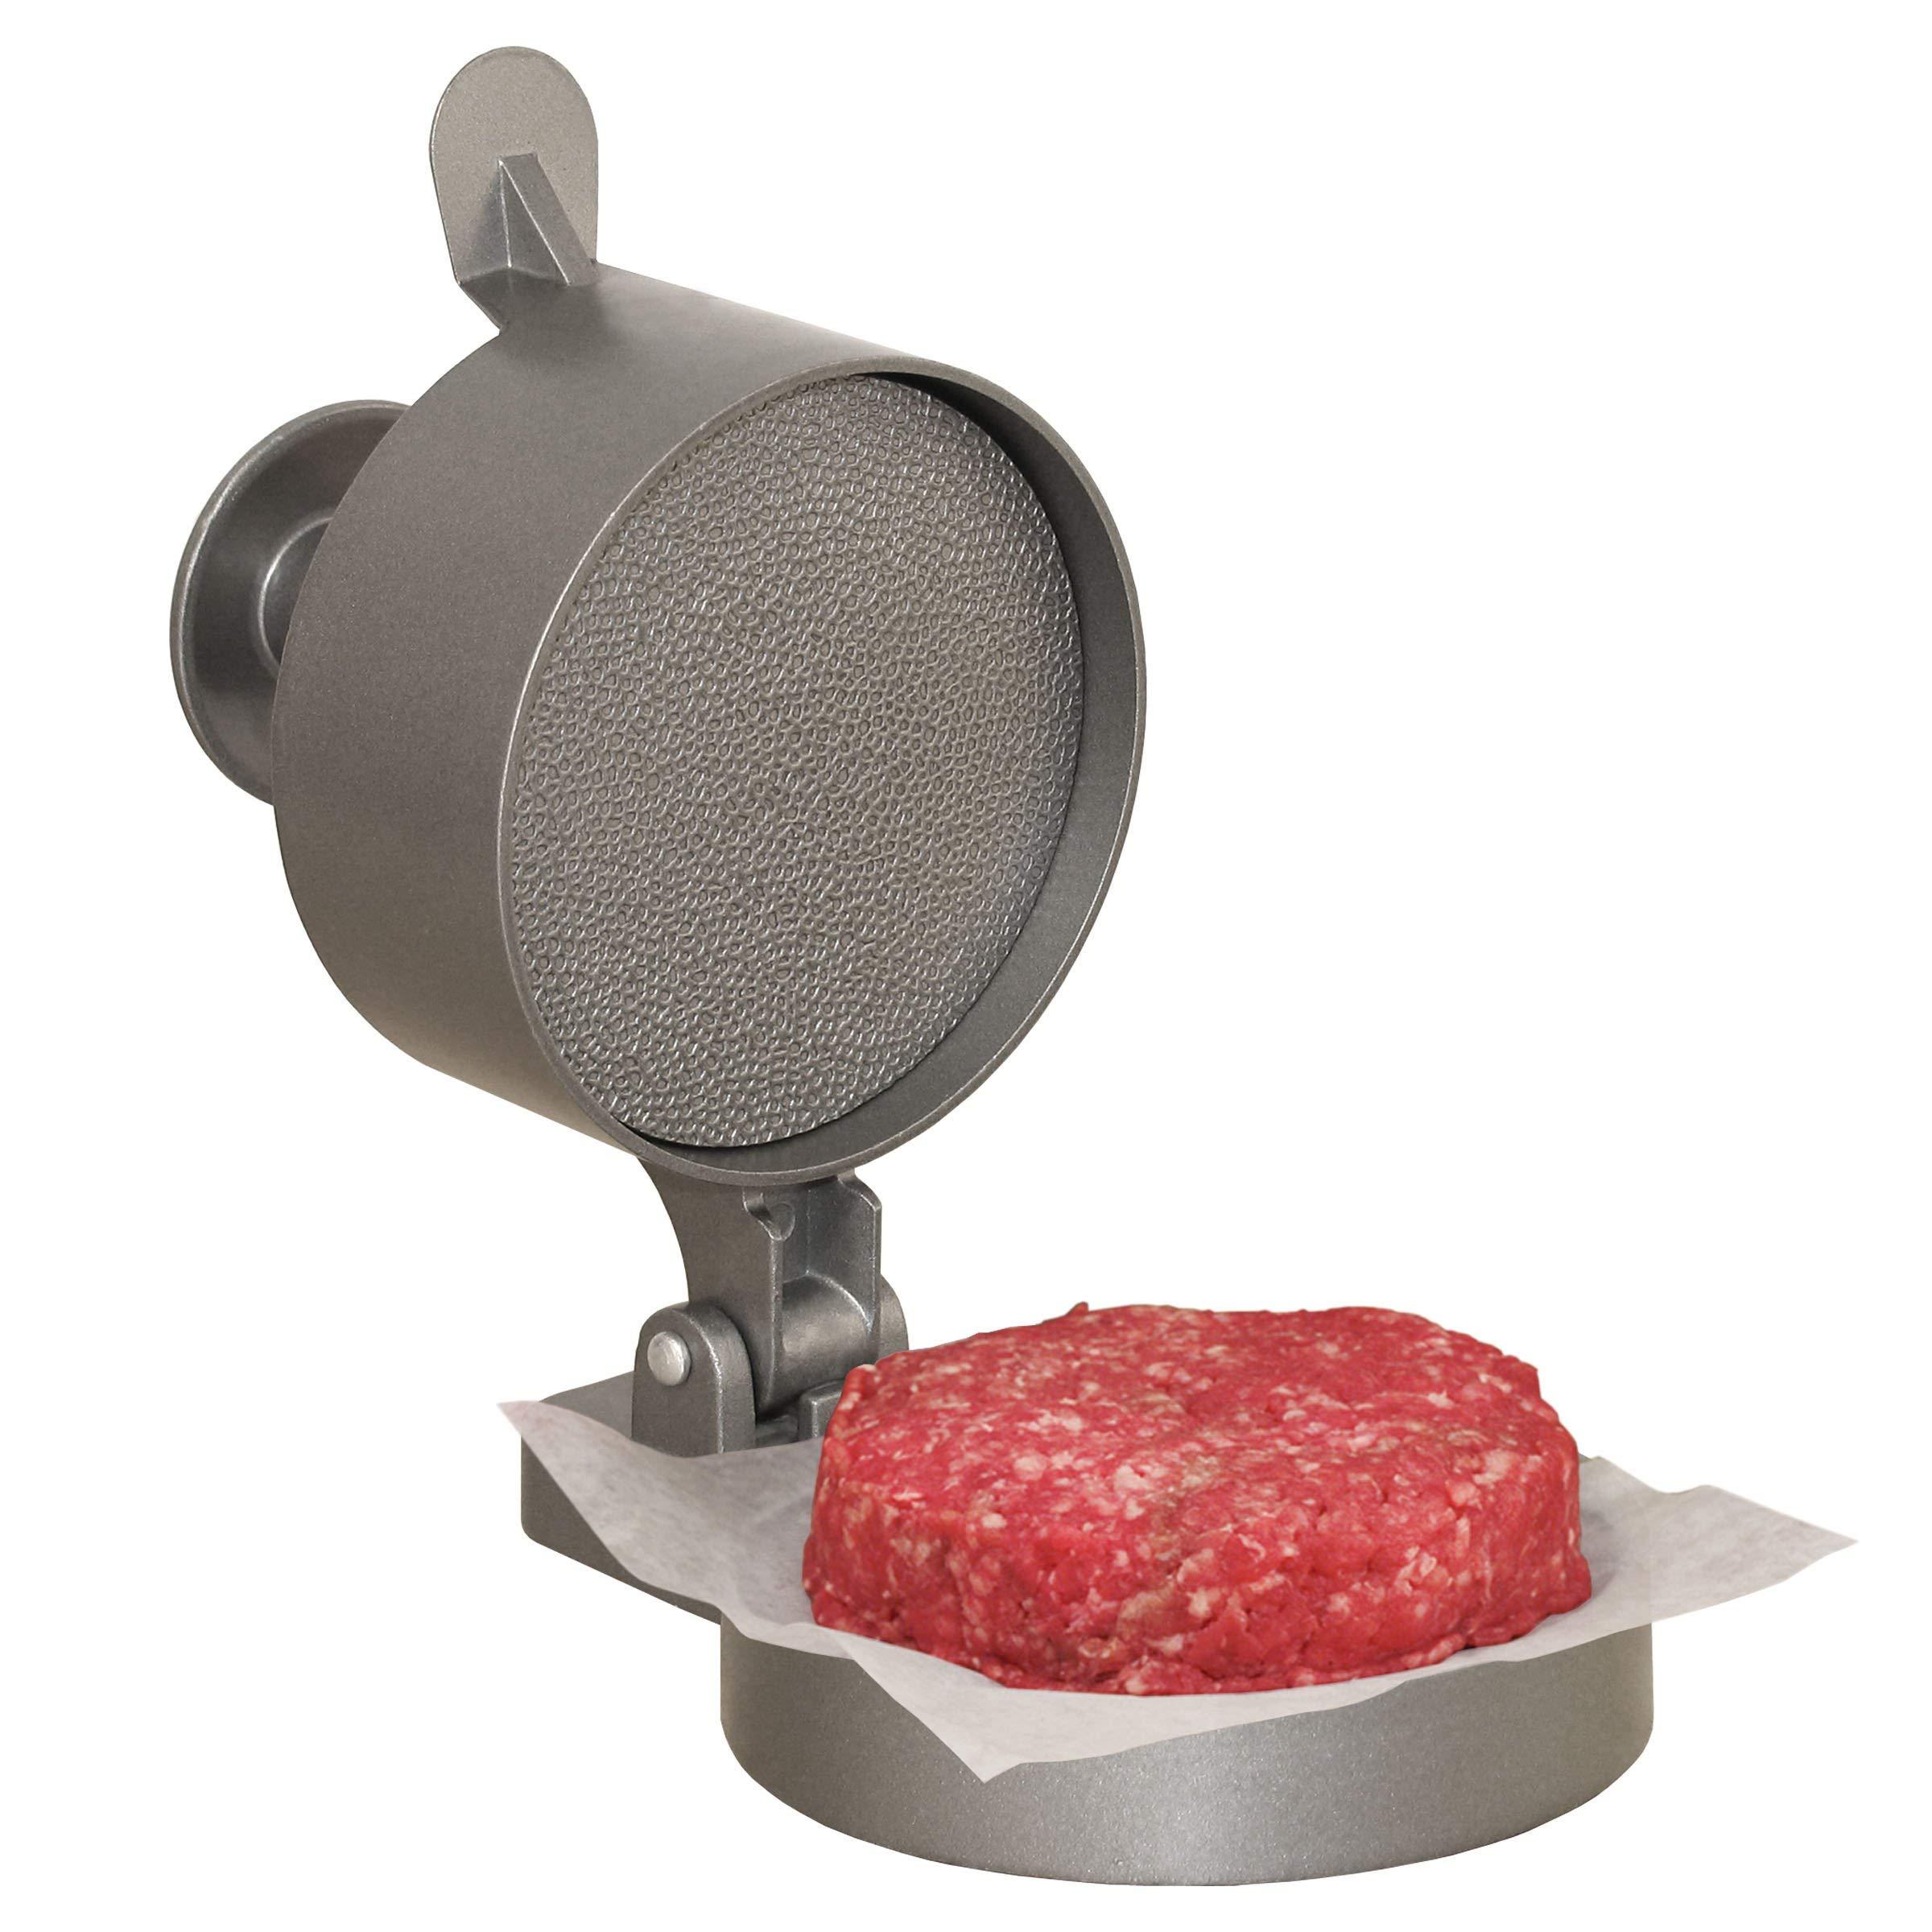 Weston Burger Express Hamburger Press with Patty Ejector (07-0310-W), Makes 4 1/2'' Patties, 1/4lb to 3/4lb (Renewed)